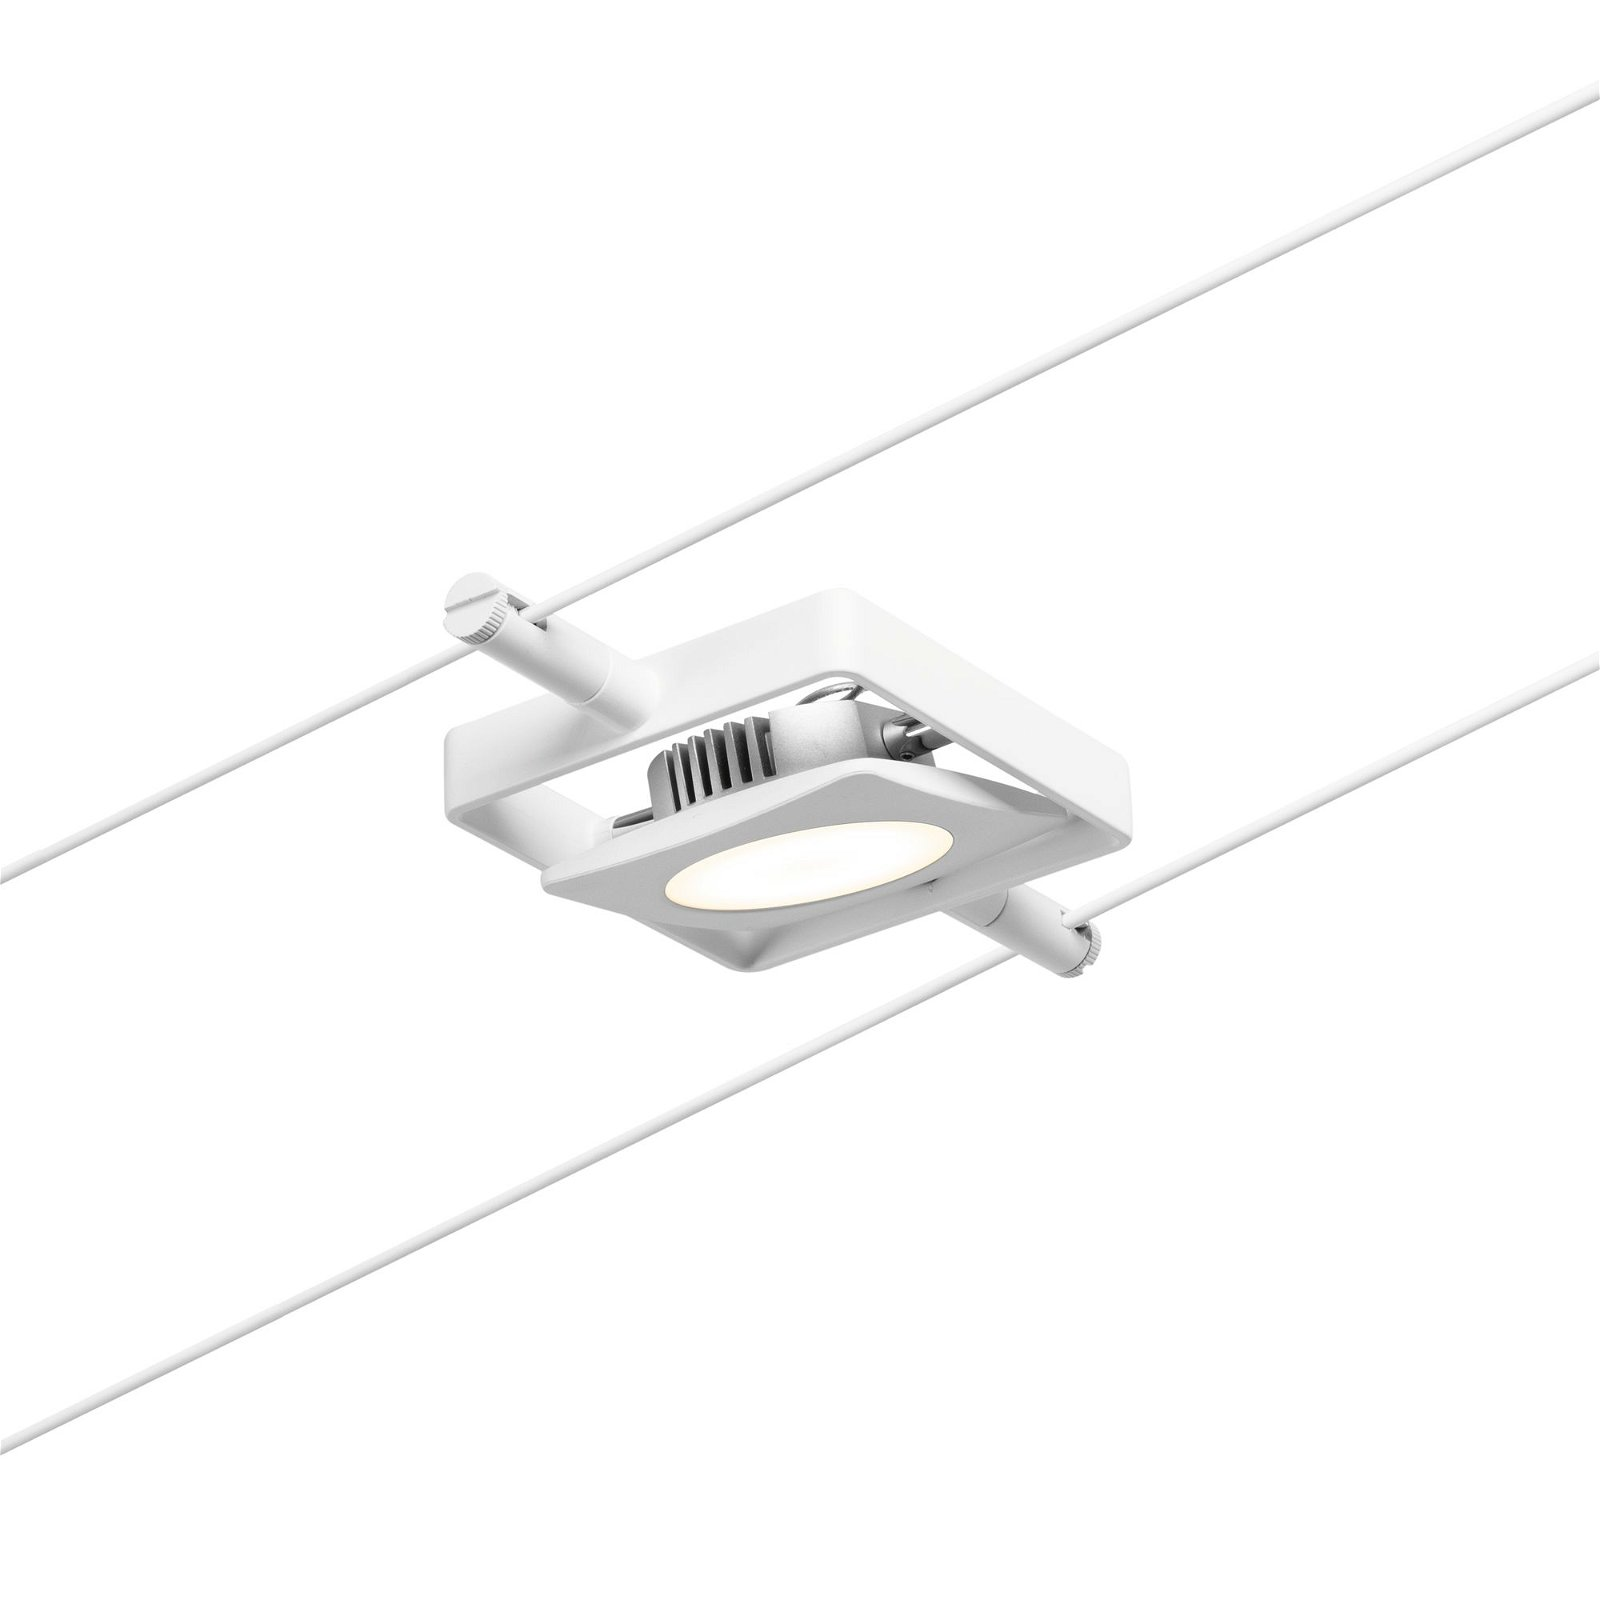 LED Seilsystem MacLED Einzelspot 450lm 4,5W 3000K 12V Weiß matt/Chrom